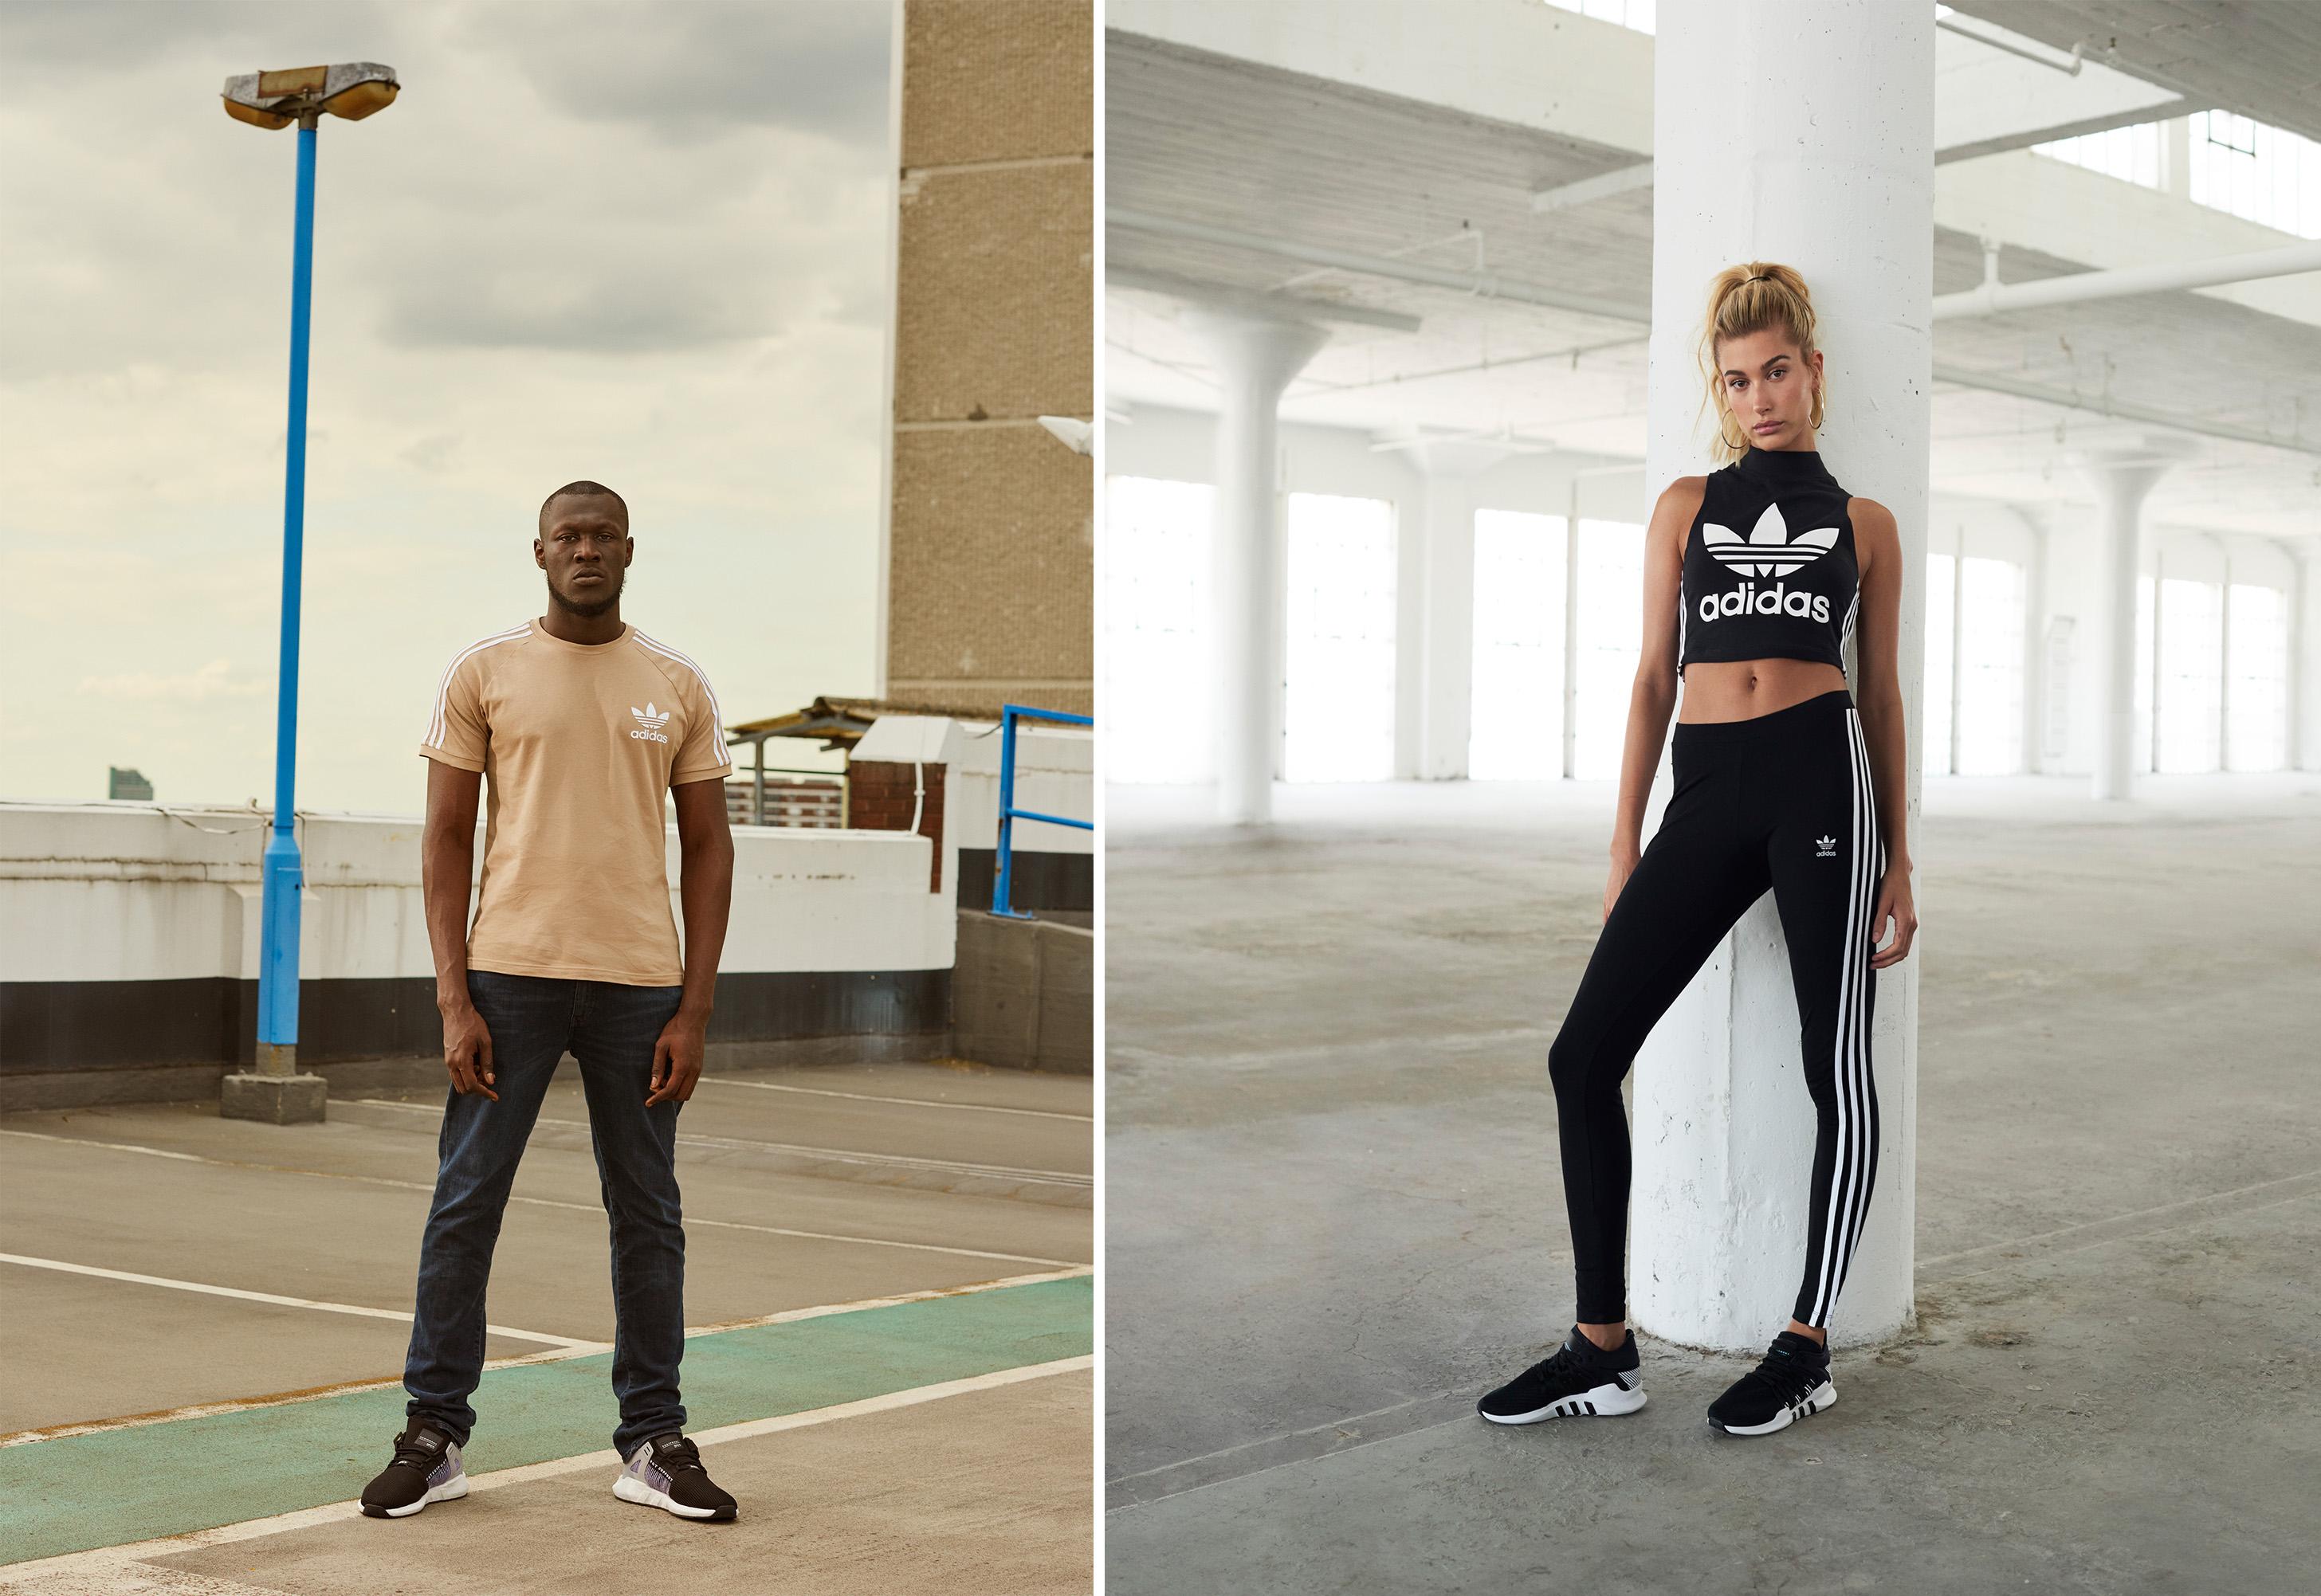 Adidas, JD Sports EQT Tap Hailey